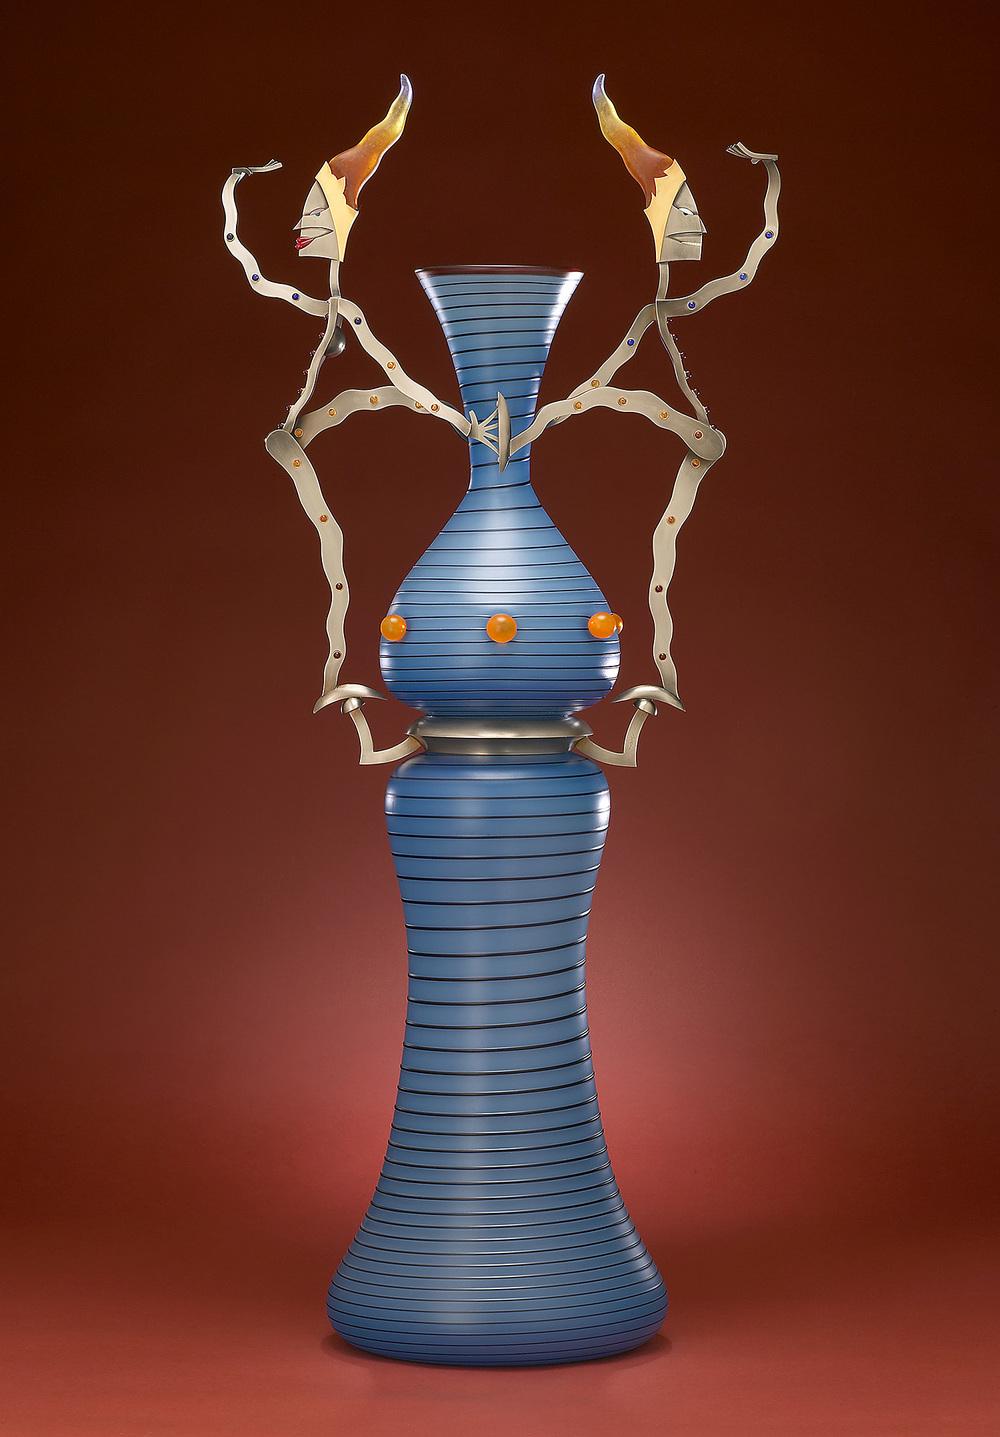 "Slippery   2003. Blown glass, nickel and gold-plated bronze, pate de verre, Vitrolite. 36 x 16 x 9½"""